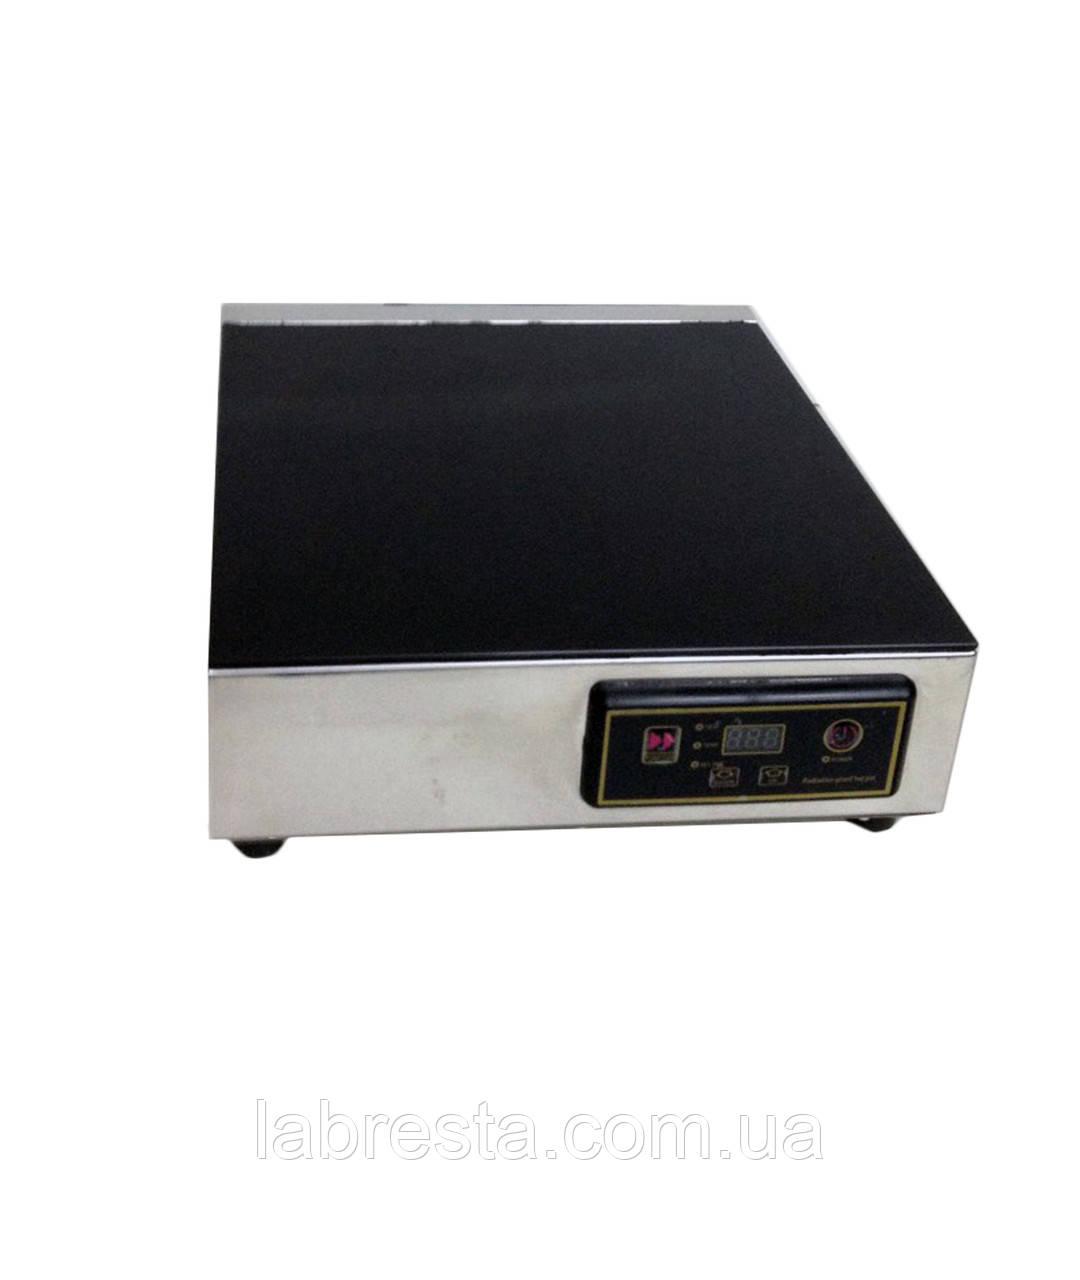 Плита индукционная Skvara Siе 1.3 (1х3 кВт)